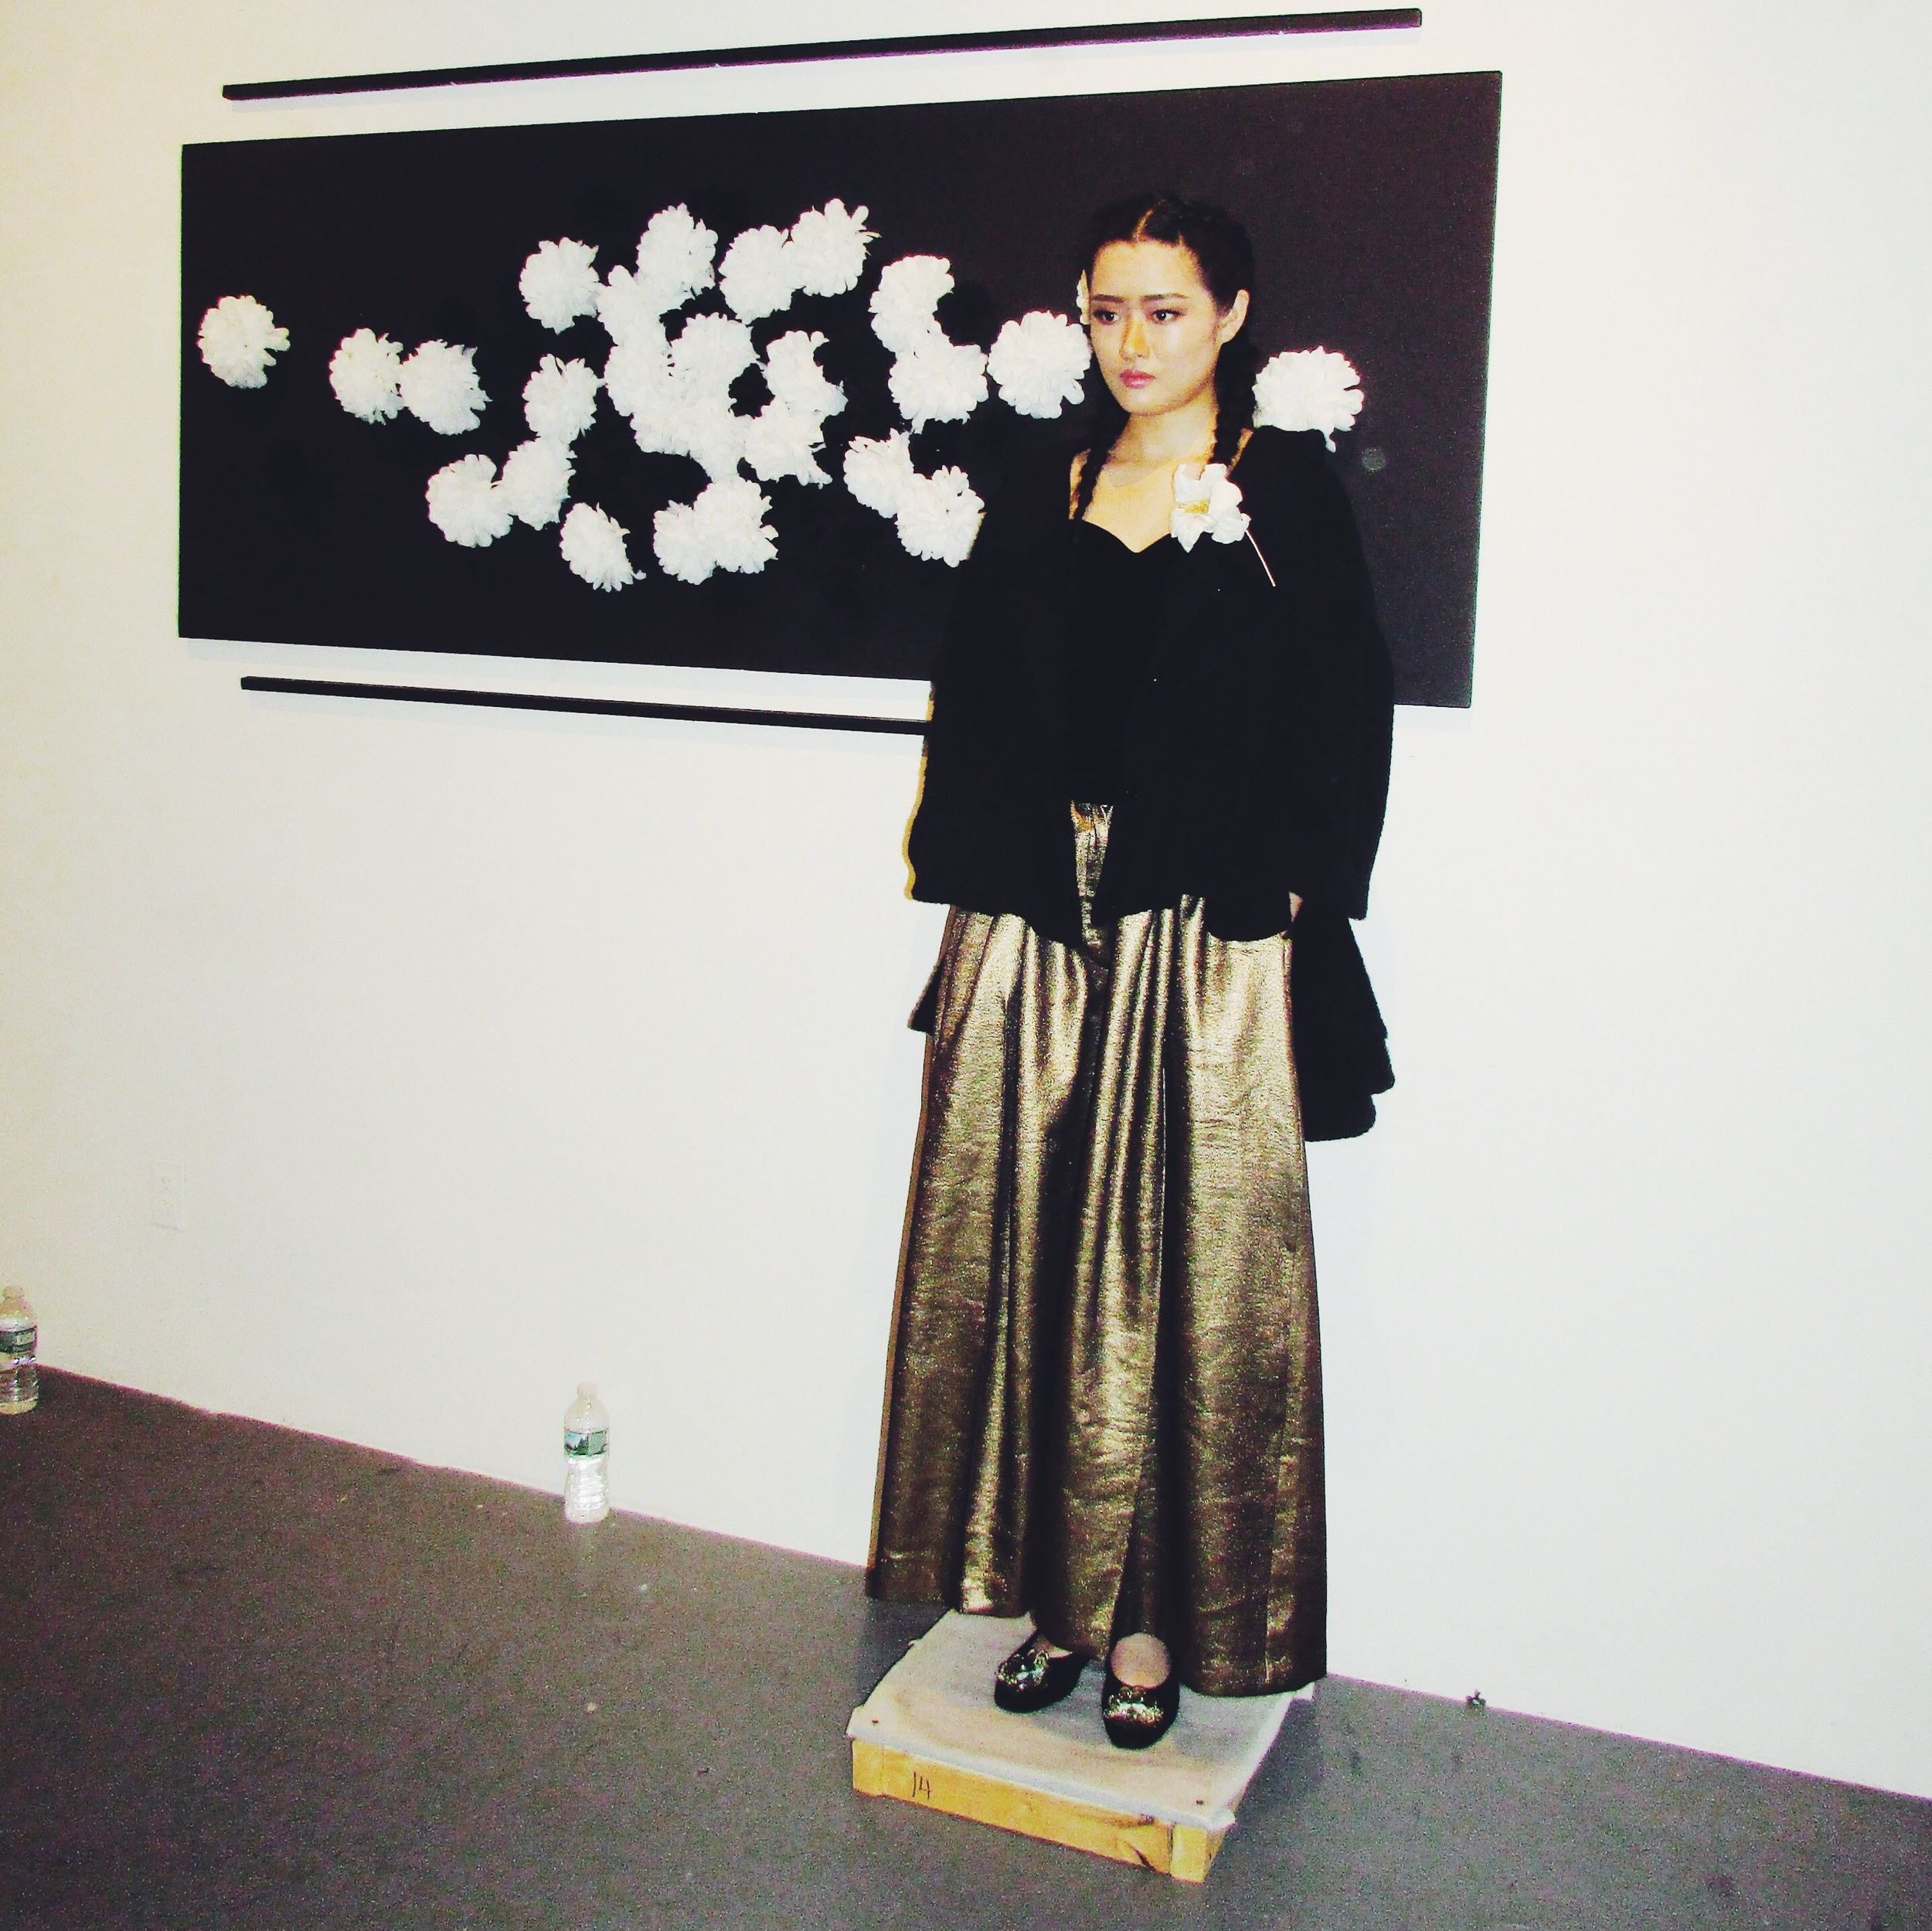 Fashion label based in Tokyo. Designer/ Eauseenon. Instagram: @Eauseenon www.eauseenon.com